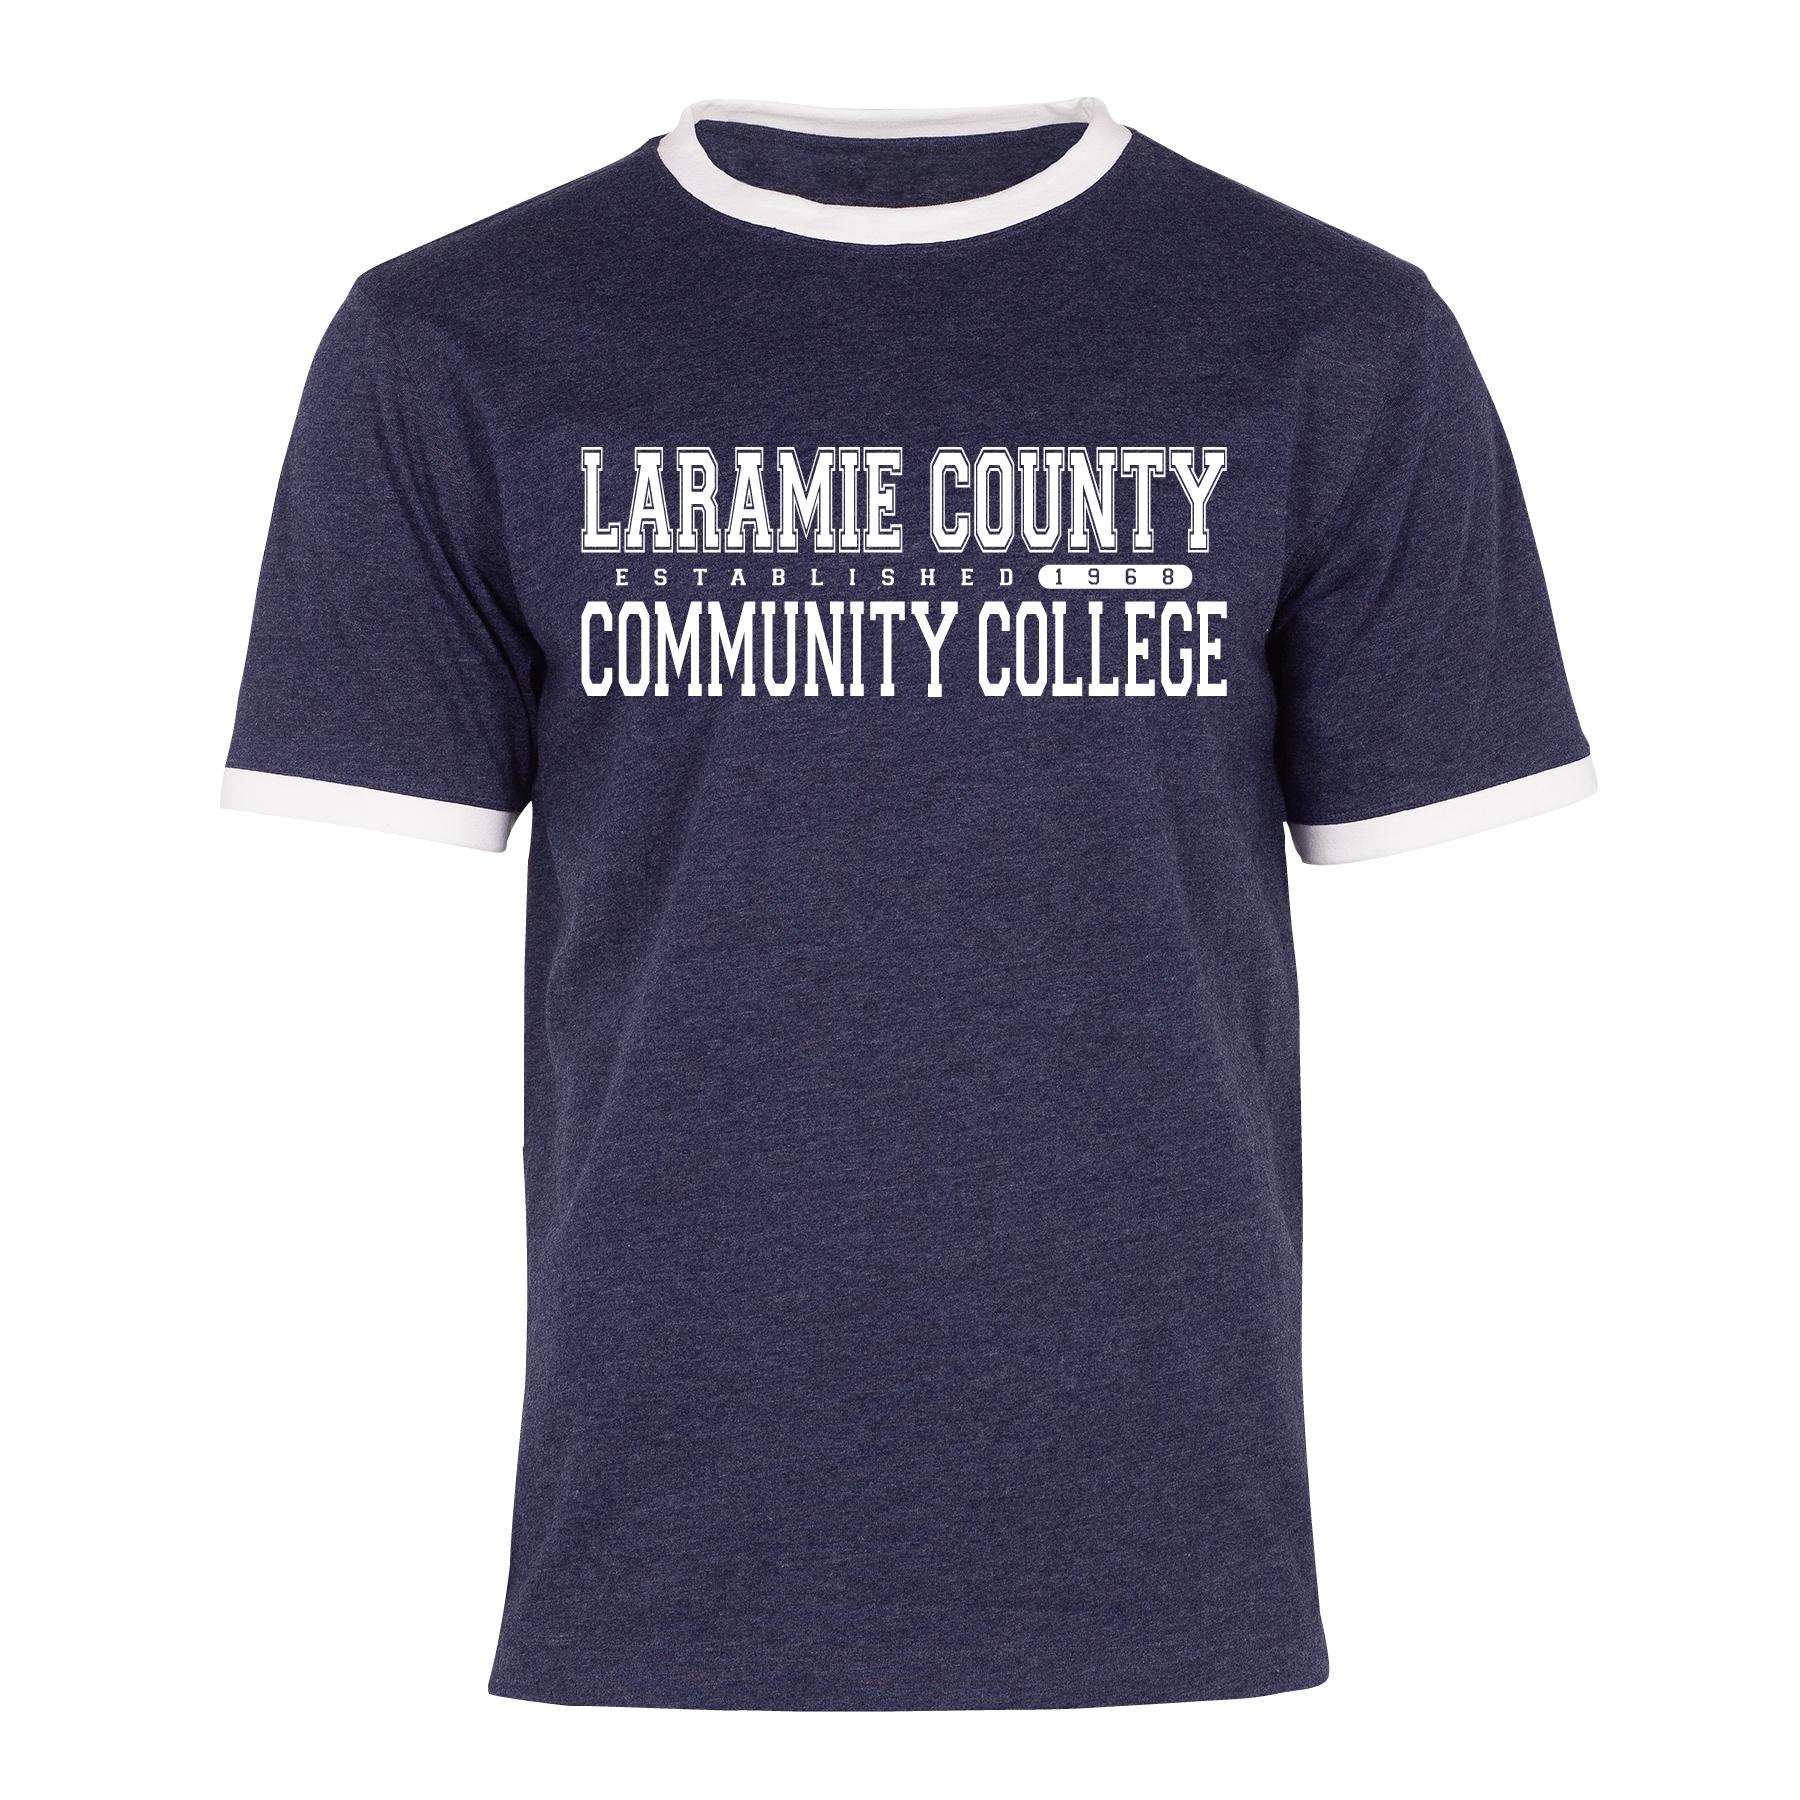 Laramie County Community College Ringer Tee